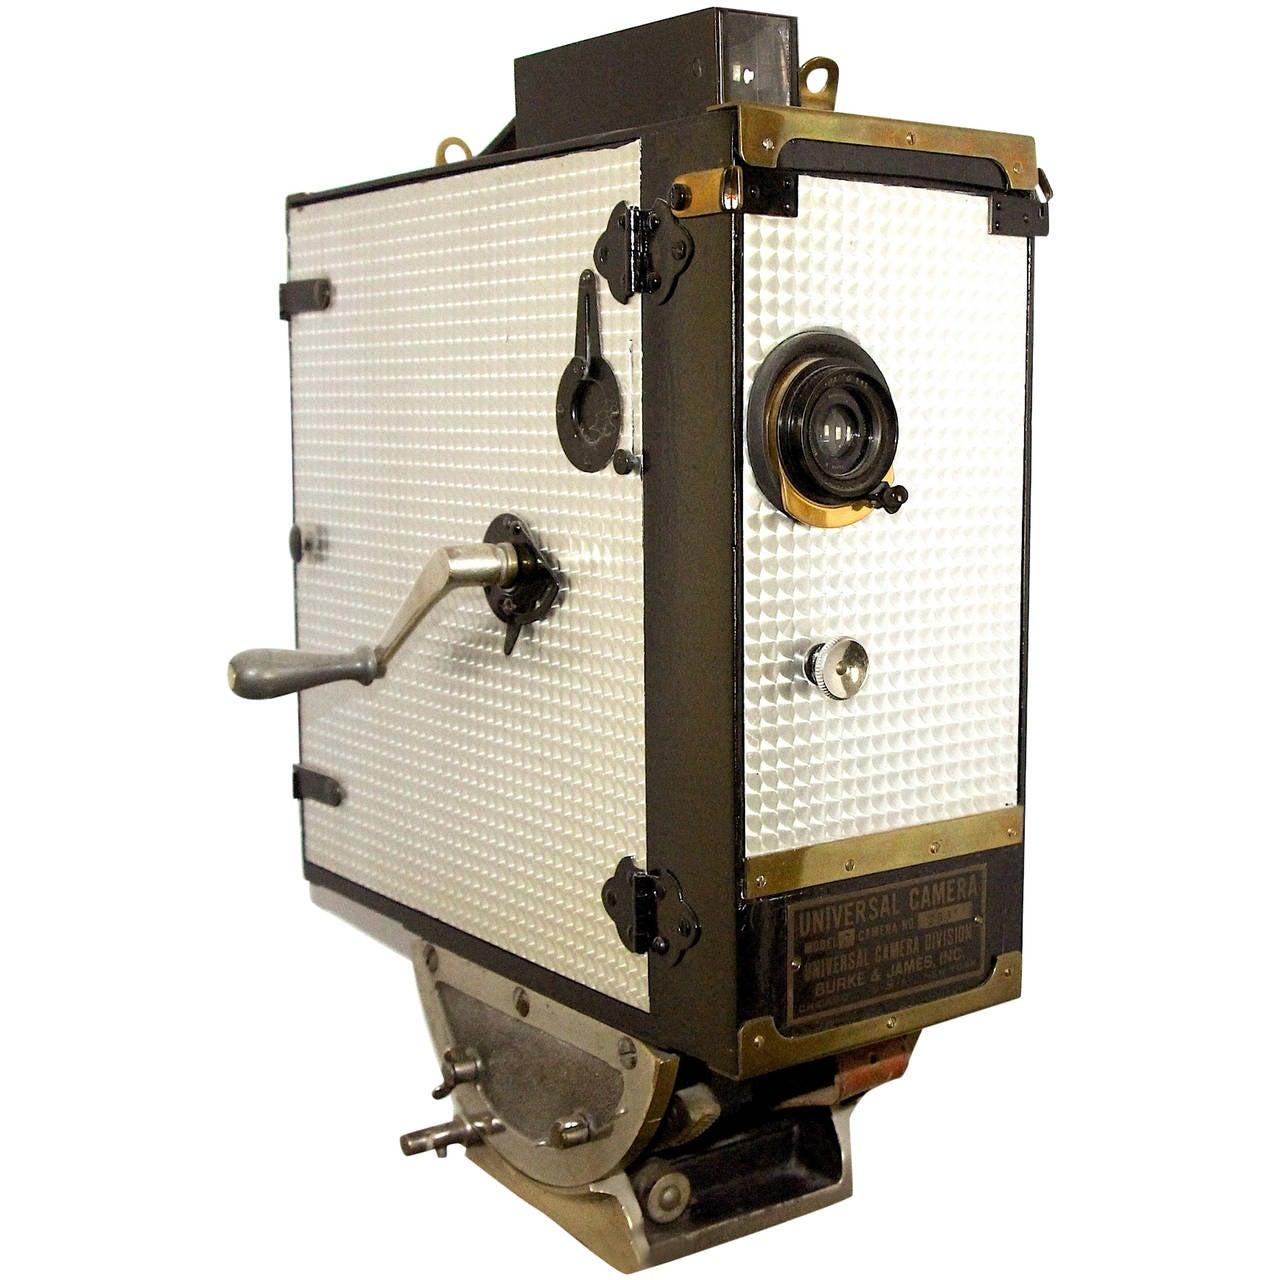 Universal Cinema Camera Built in 1928 Rare Cinema Field Camera. Use As Sculpture